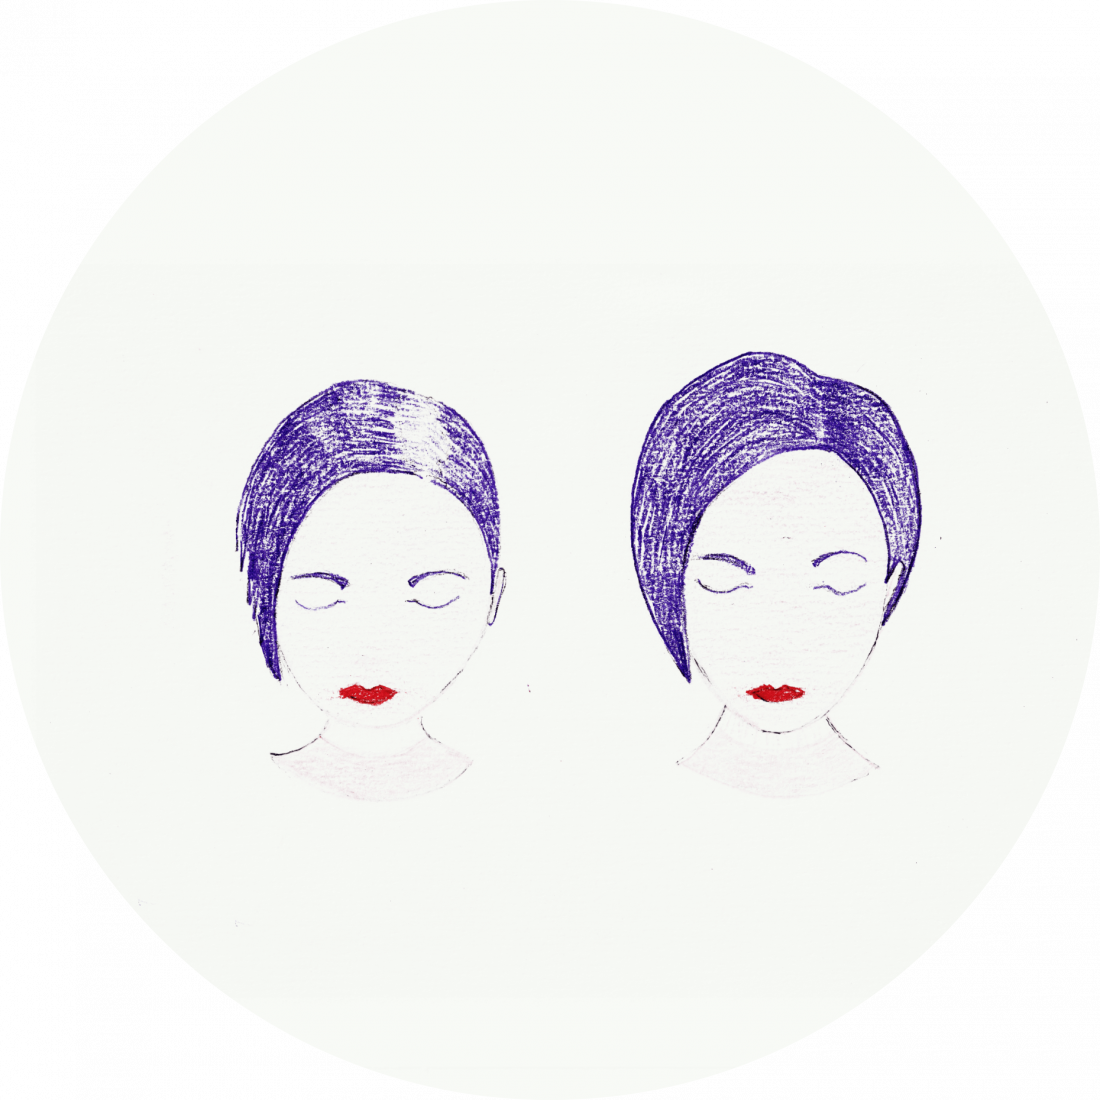 Procedure details: Hair Transplantation